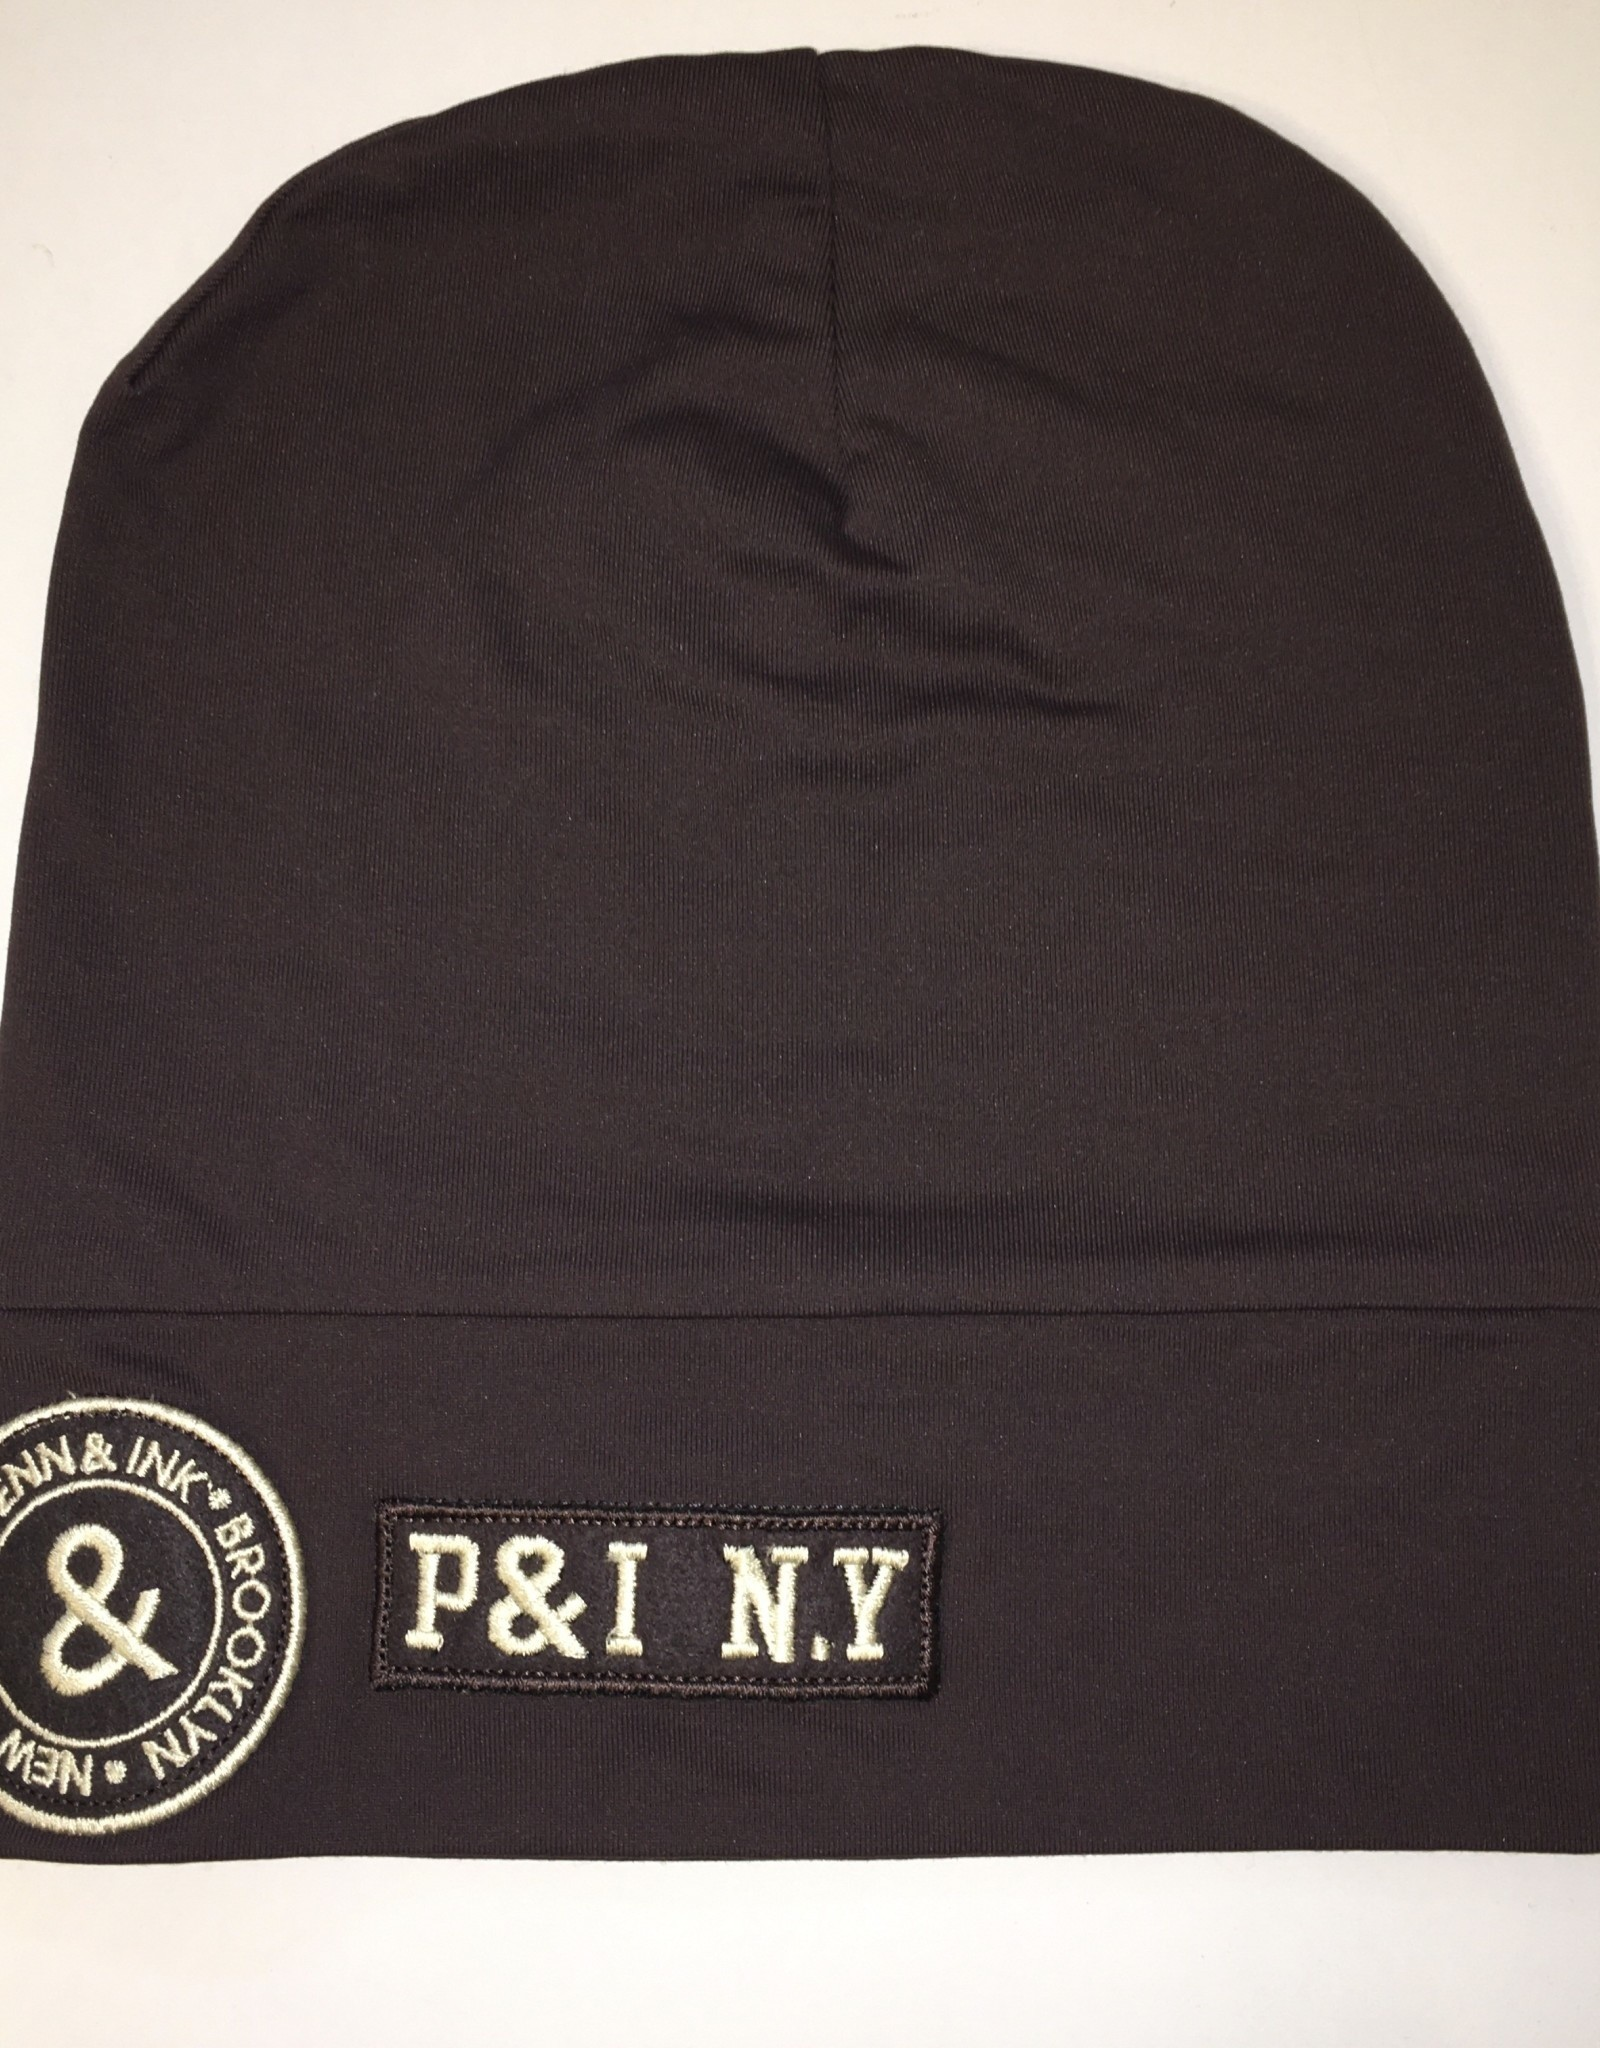 Penn & Ink N.Y. Muts Grape One Size